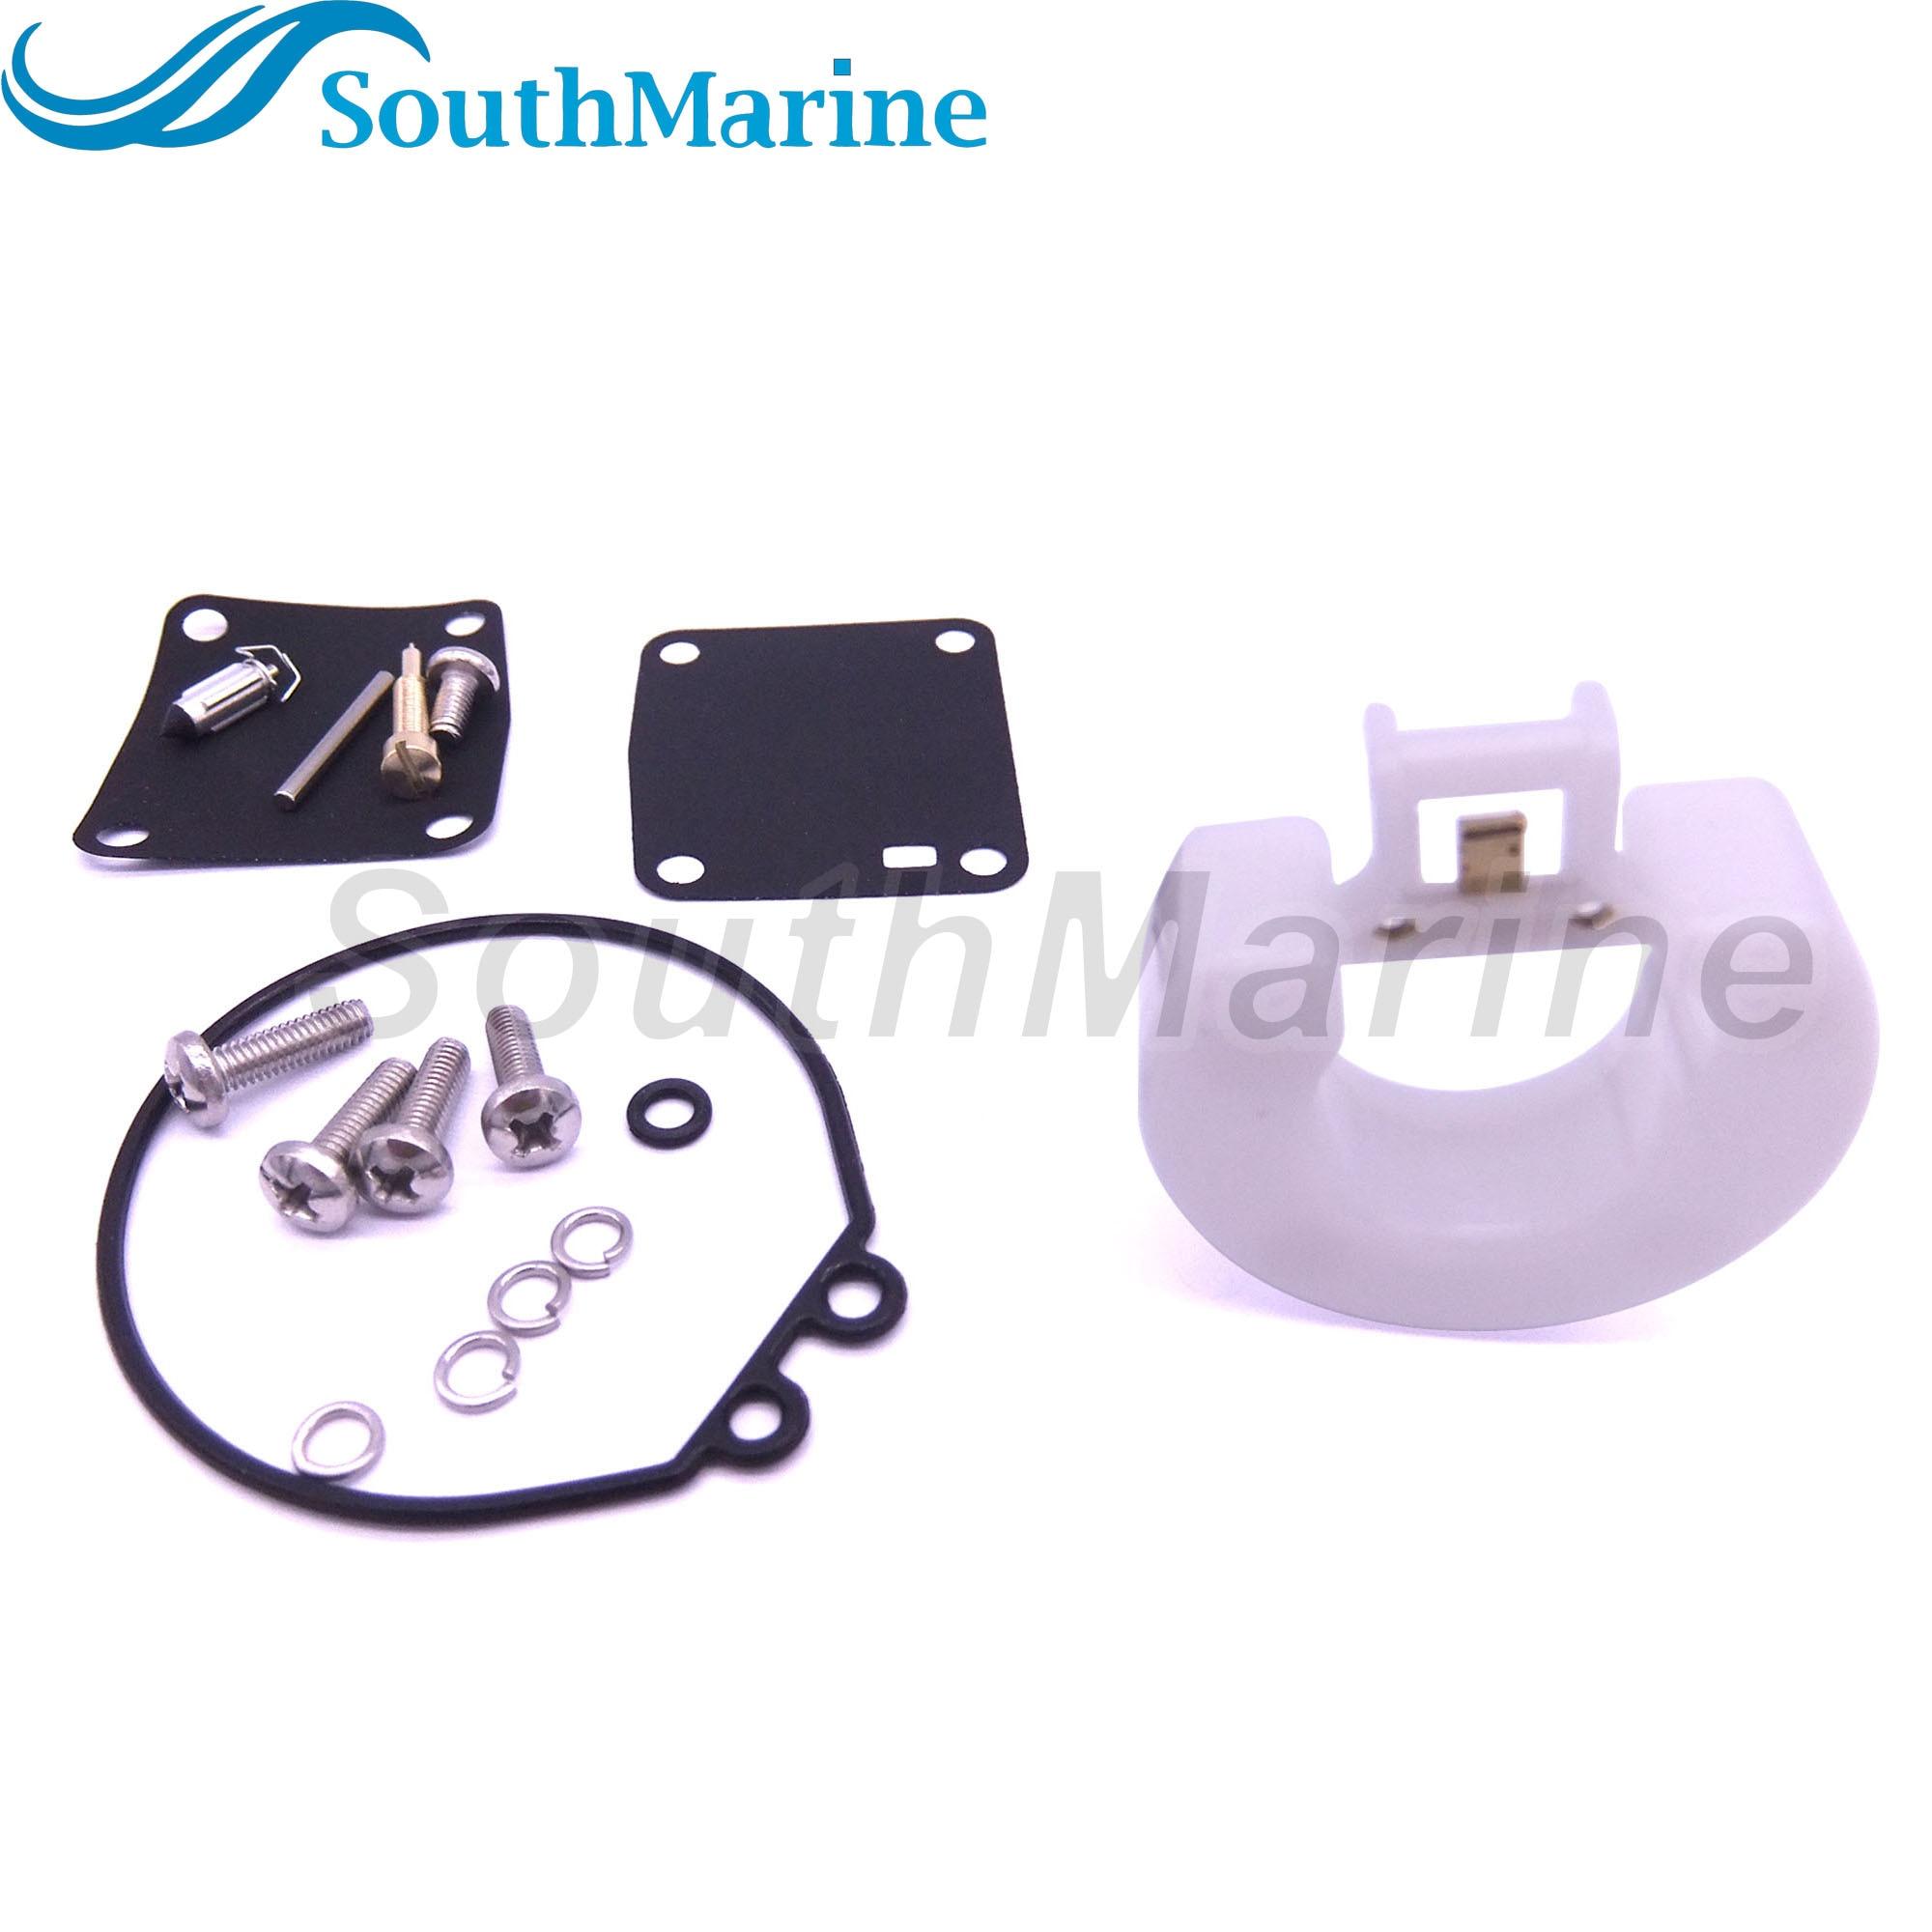 Boat Motor Carburetor Repair Kit 6G1-W0093-00-00 18-7765 For Yamaha 3HP 6HP 8HP 6CMH 6DMH 8CMH Outboard Engine